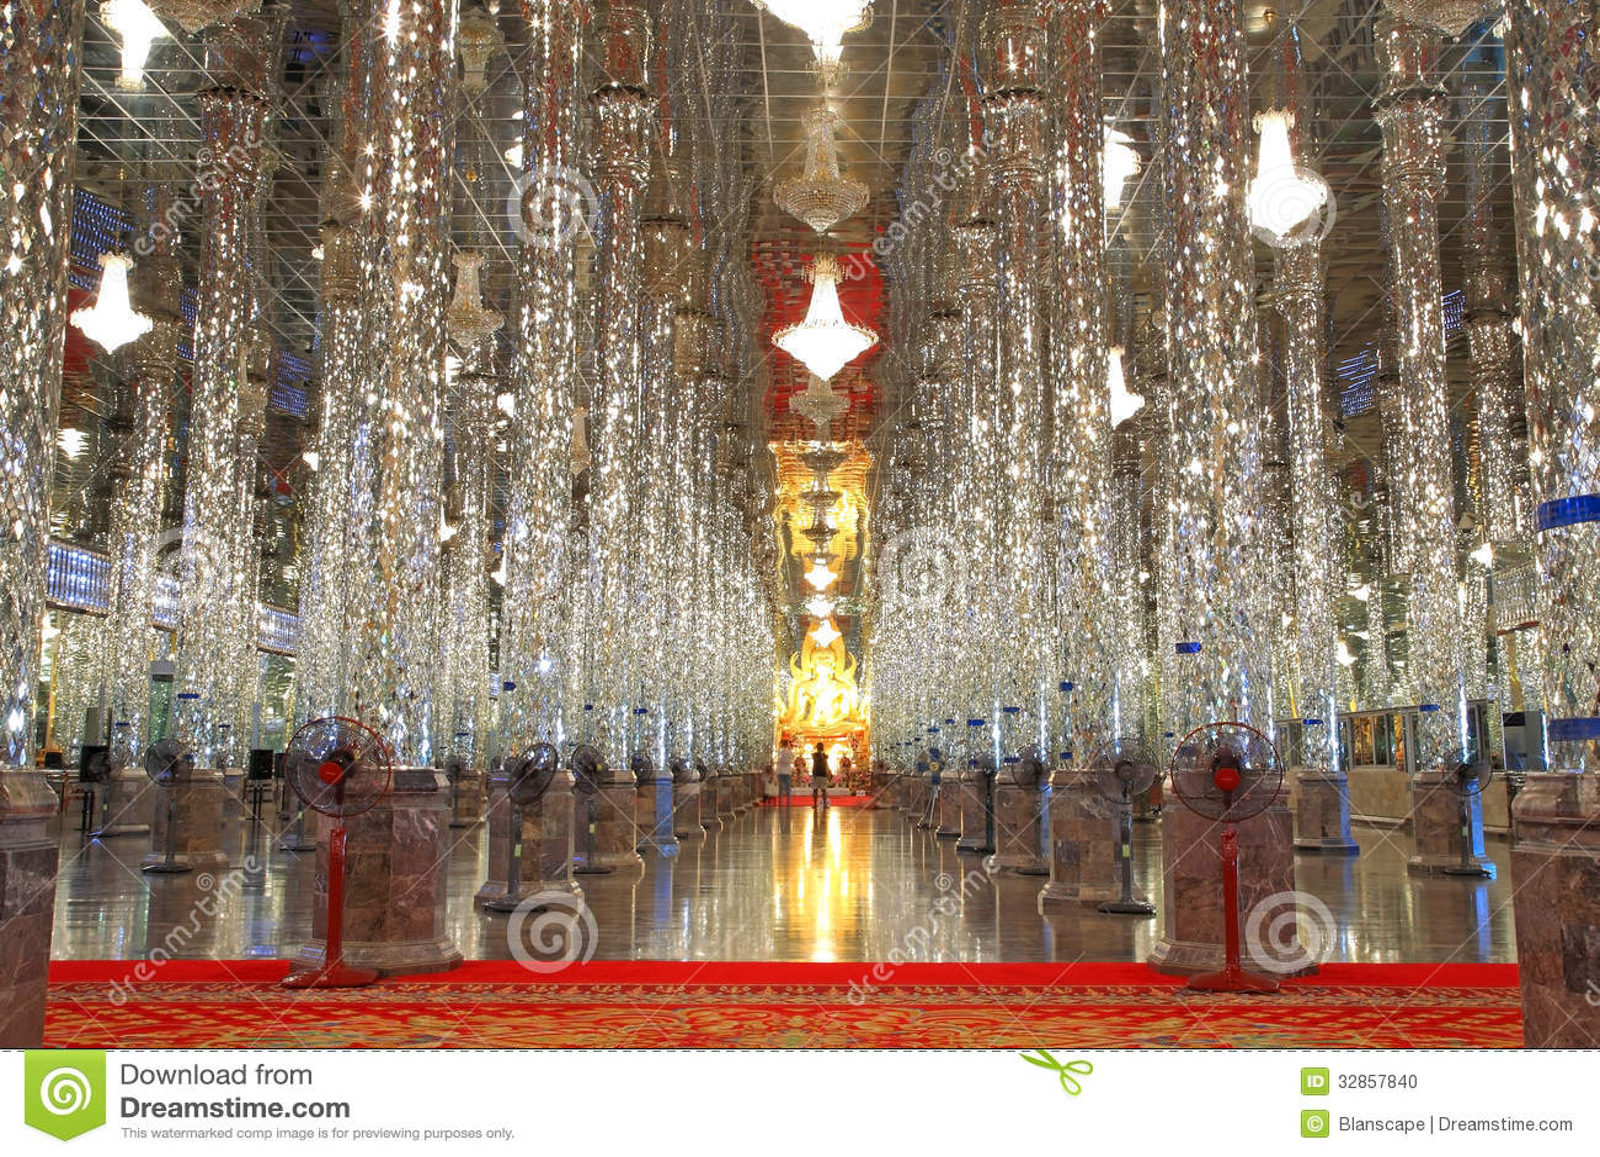 Uthai Thani Thailand  city photos gallery : UTHAI THANI, THAILAND MAY 14: glass pillars and golden Buddha statue ...